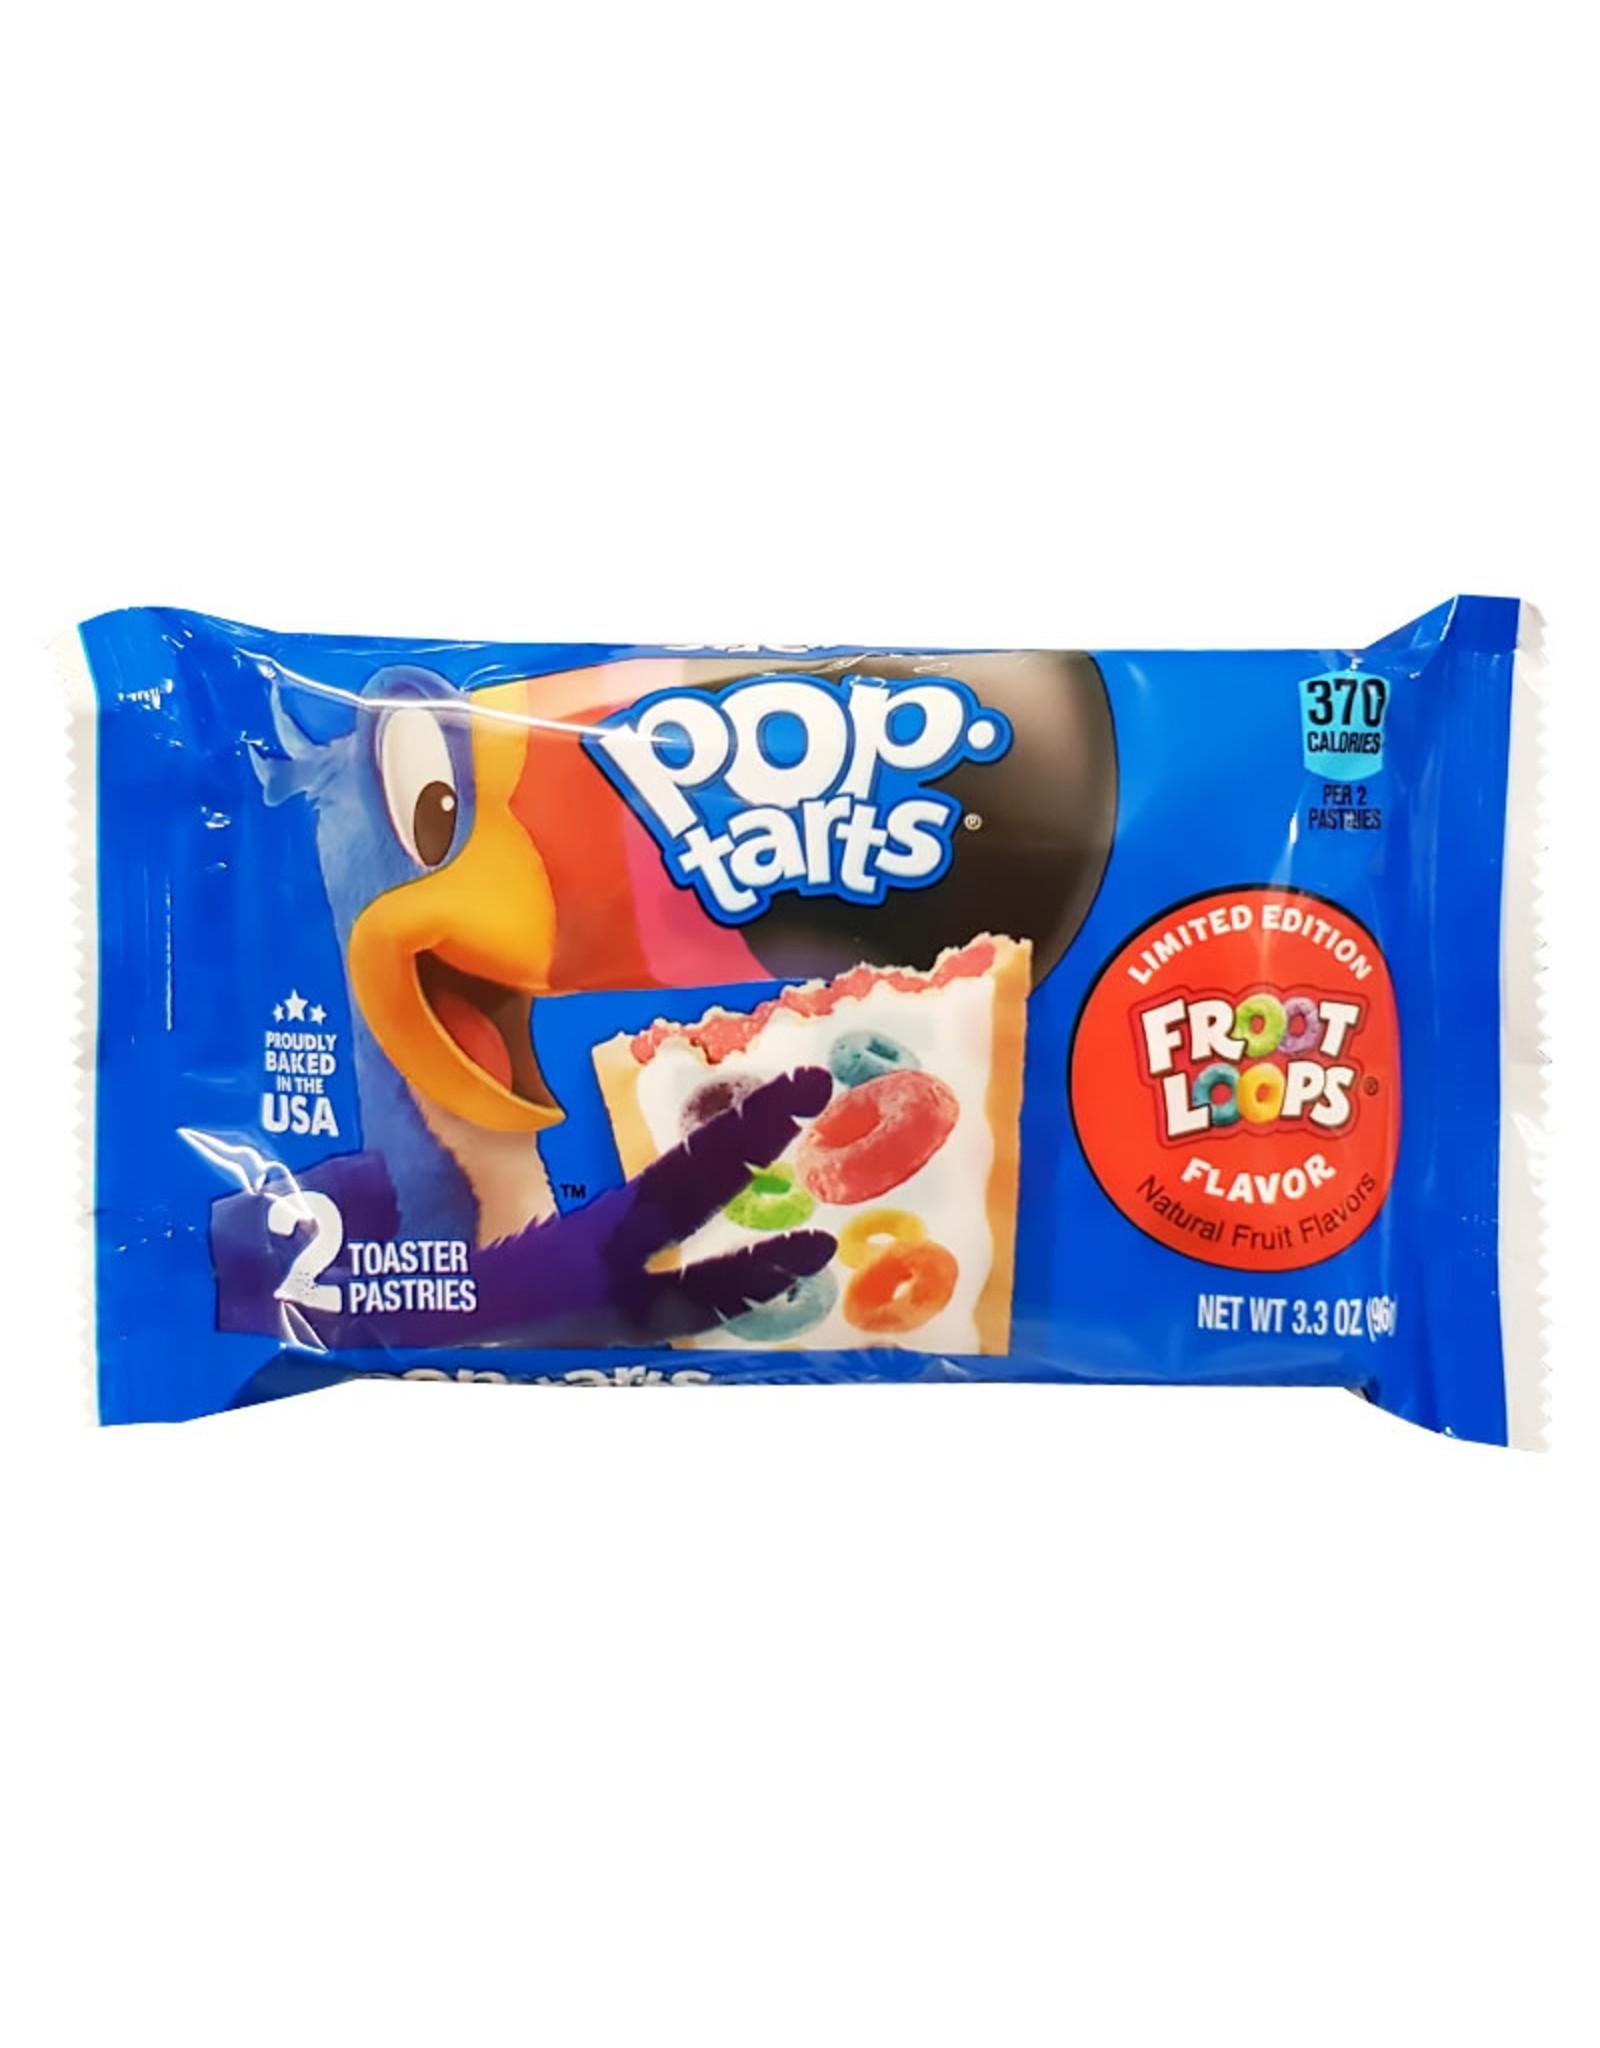 Pop-Tarts Froot Loops Flavor - 2 Pack (96g)